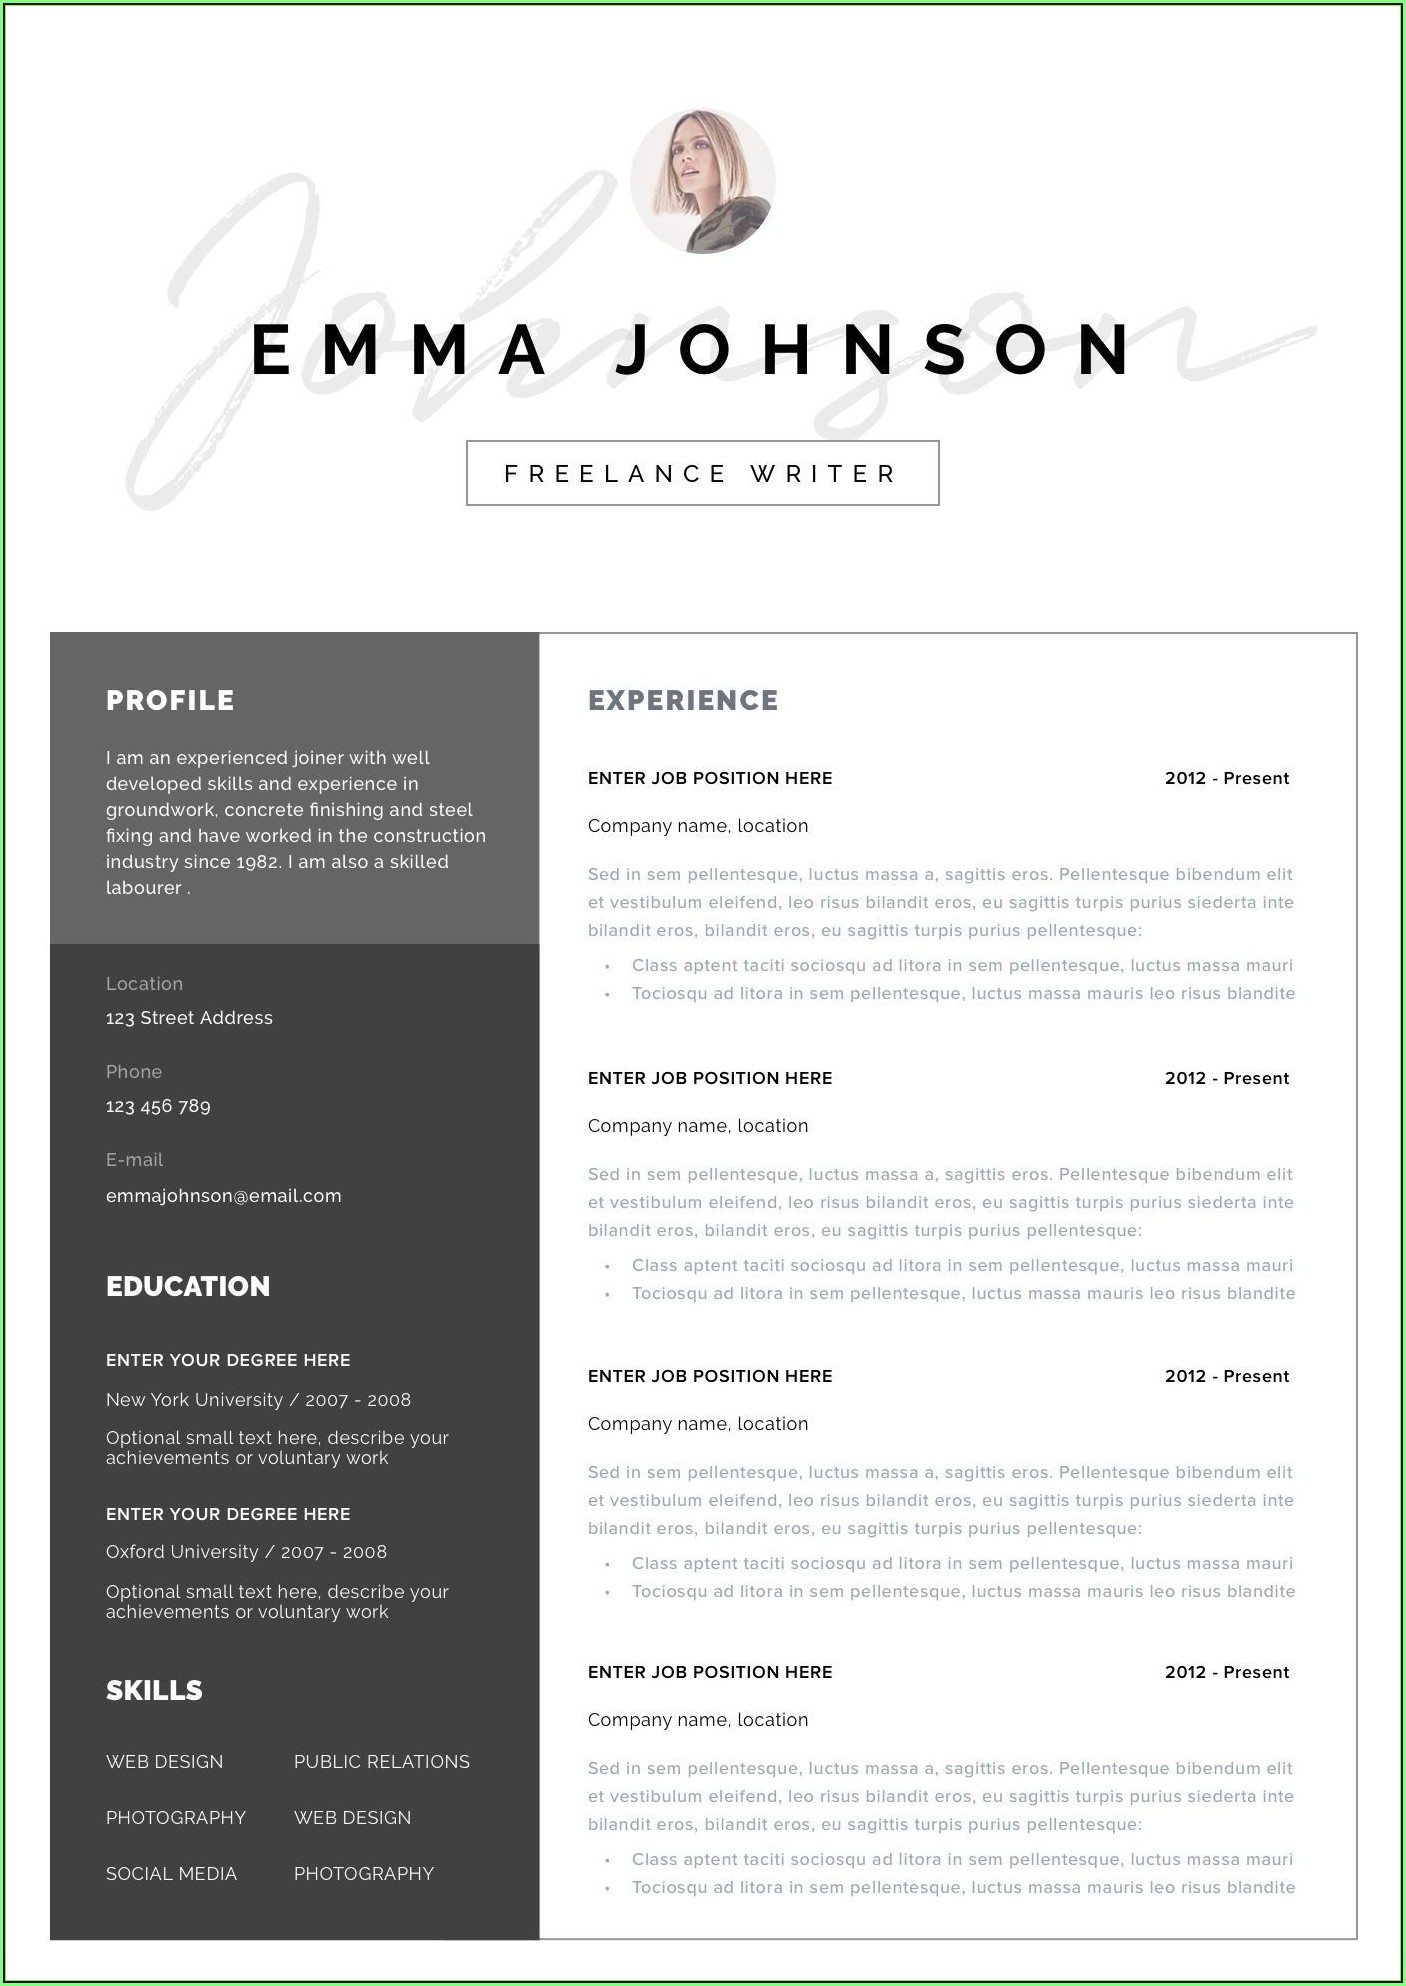 Free Resume Templates For Mac Microsoft Word